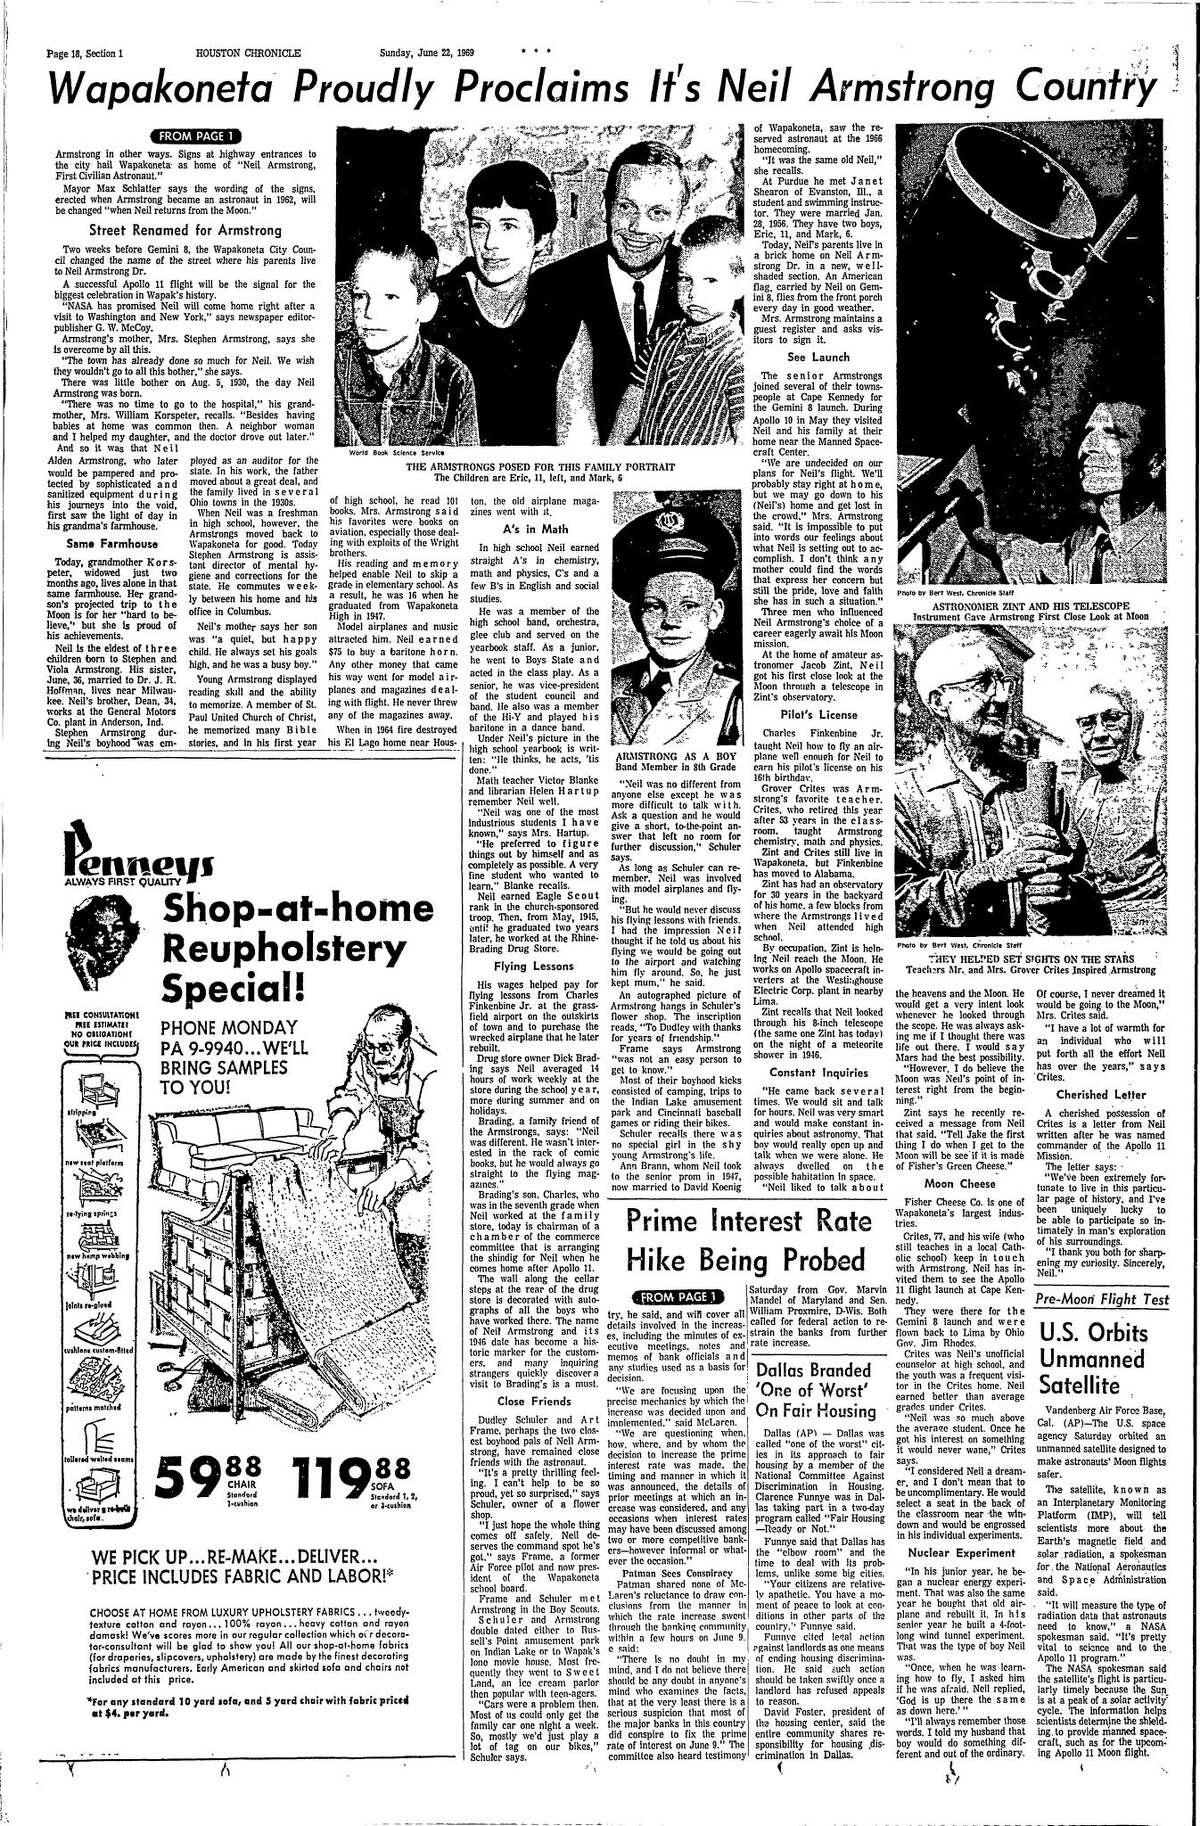 June 22, 1969